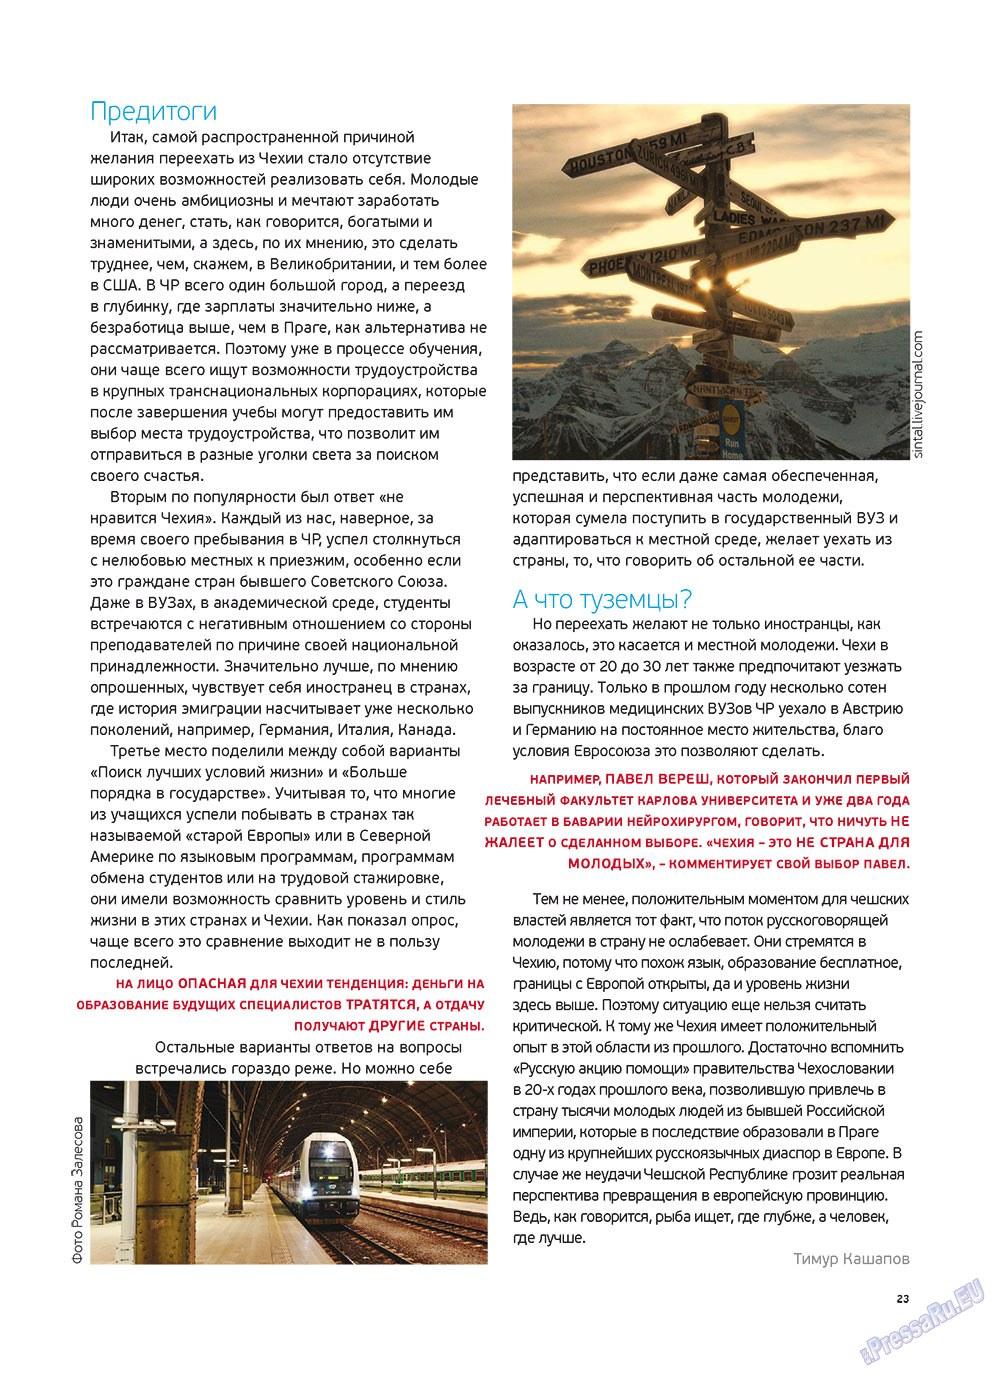 Артек (журнал). 2012 год, номер 2, стр. 25